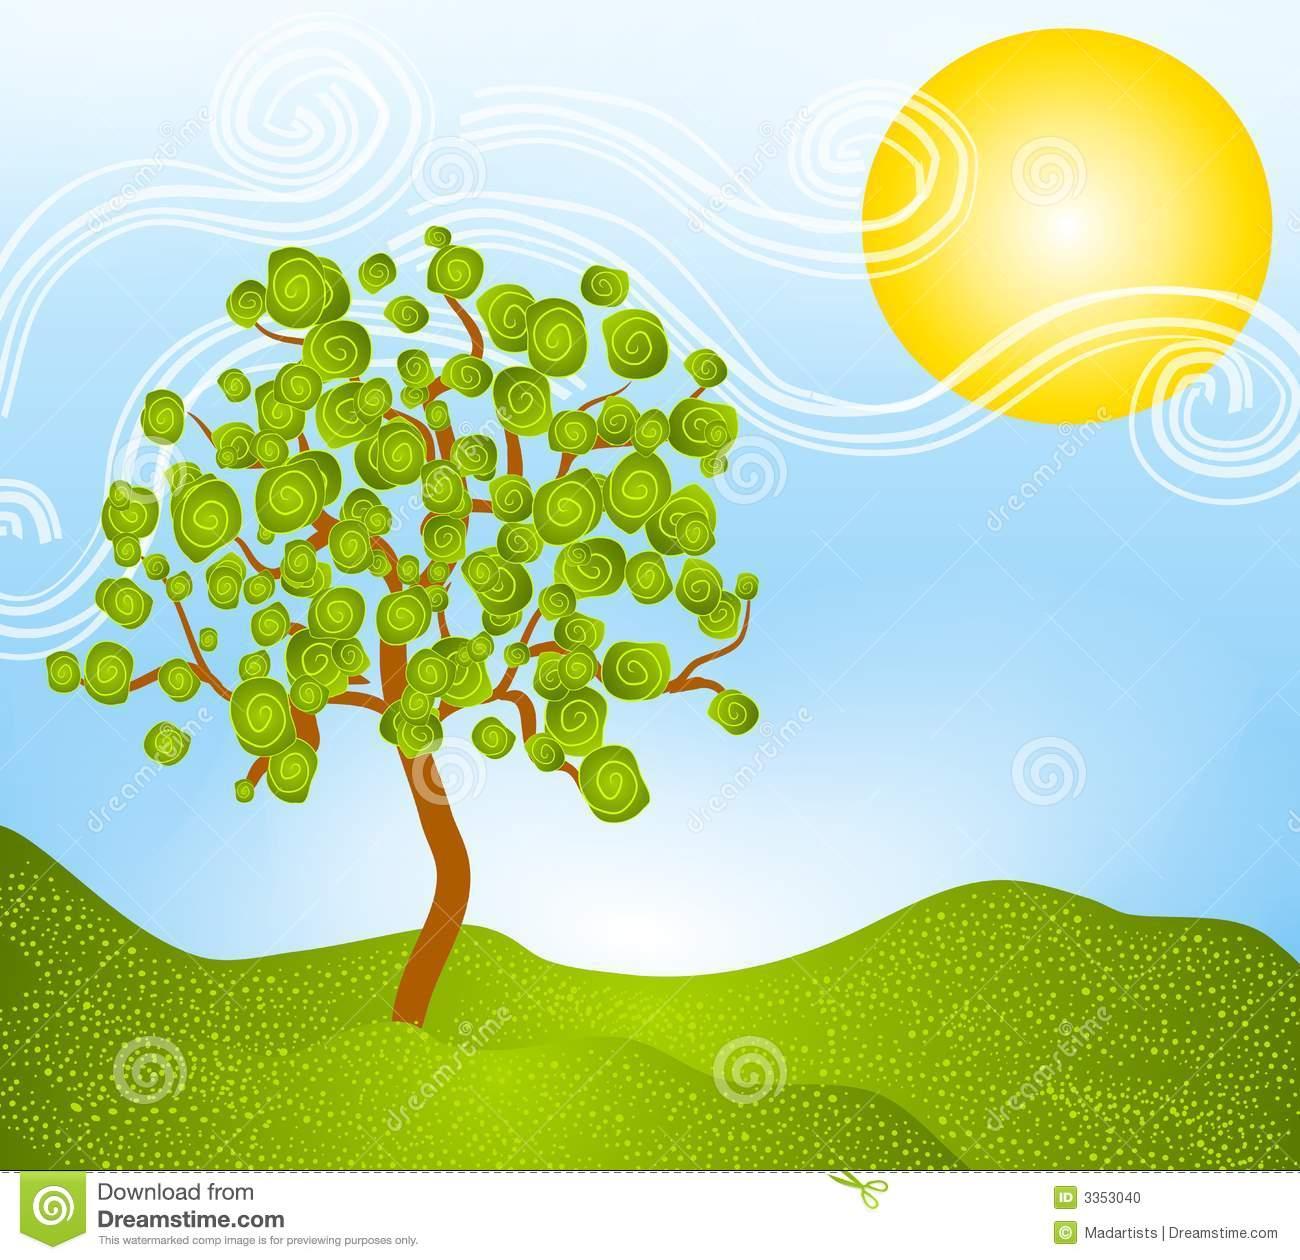 Season clipart summer tree #11